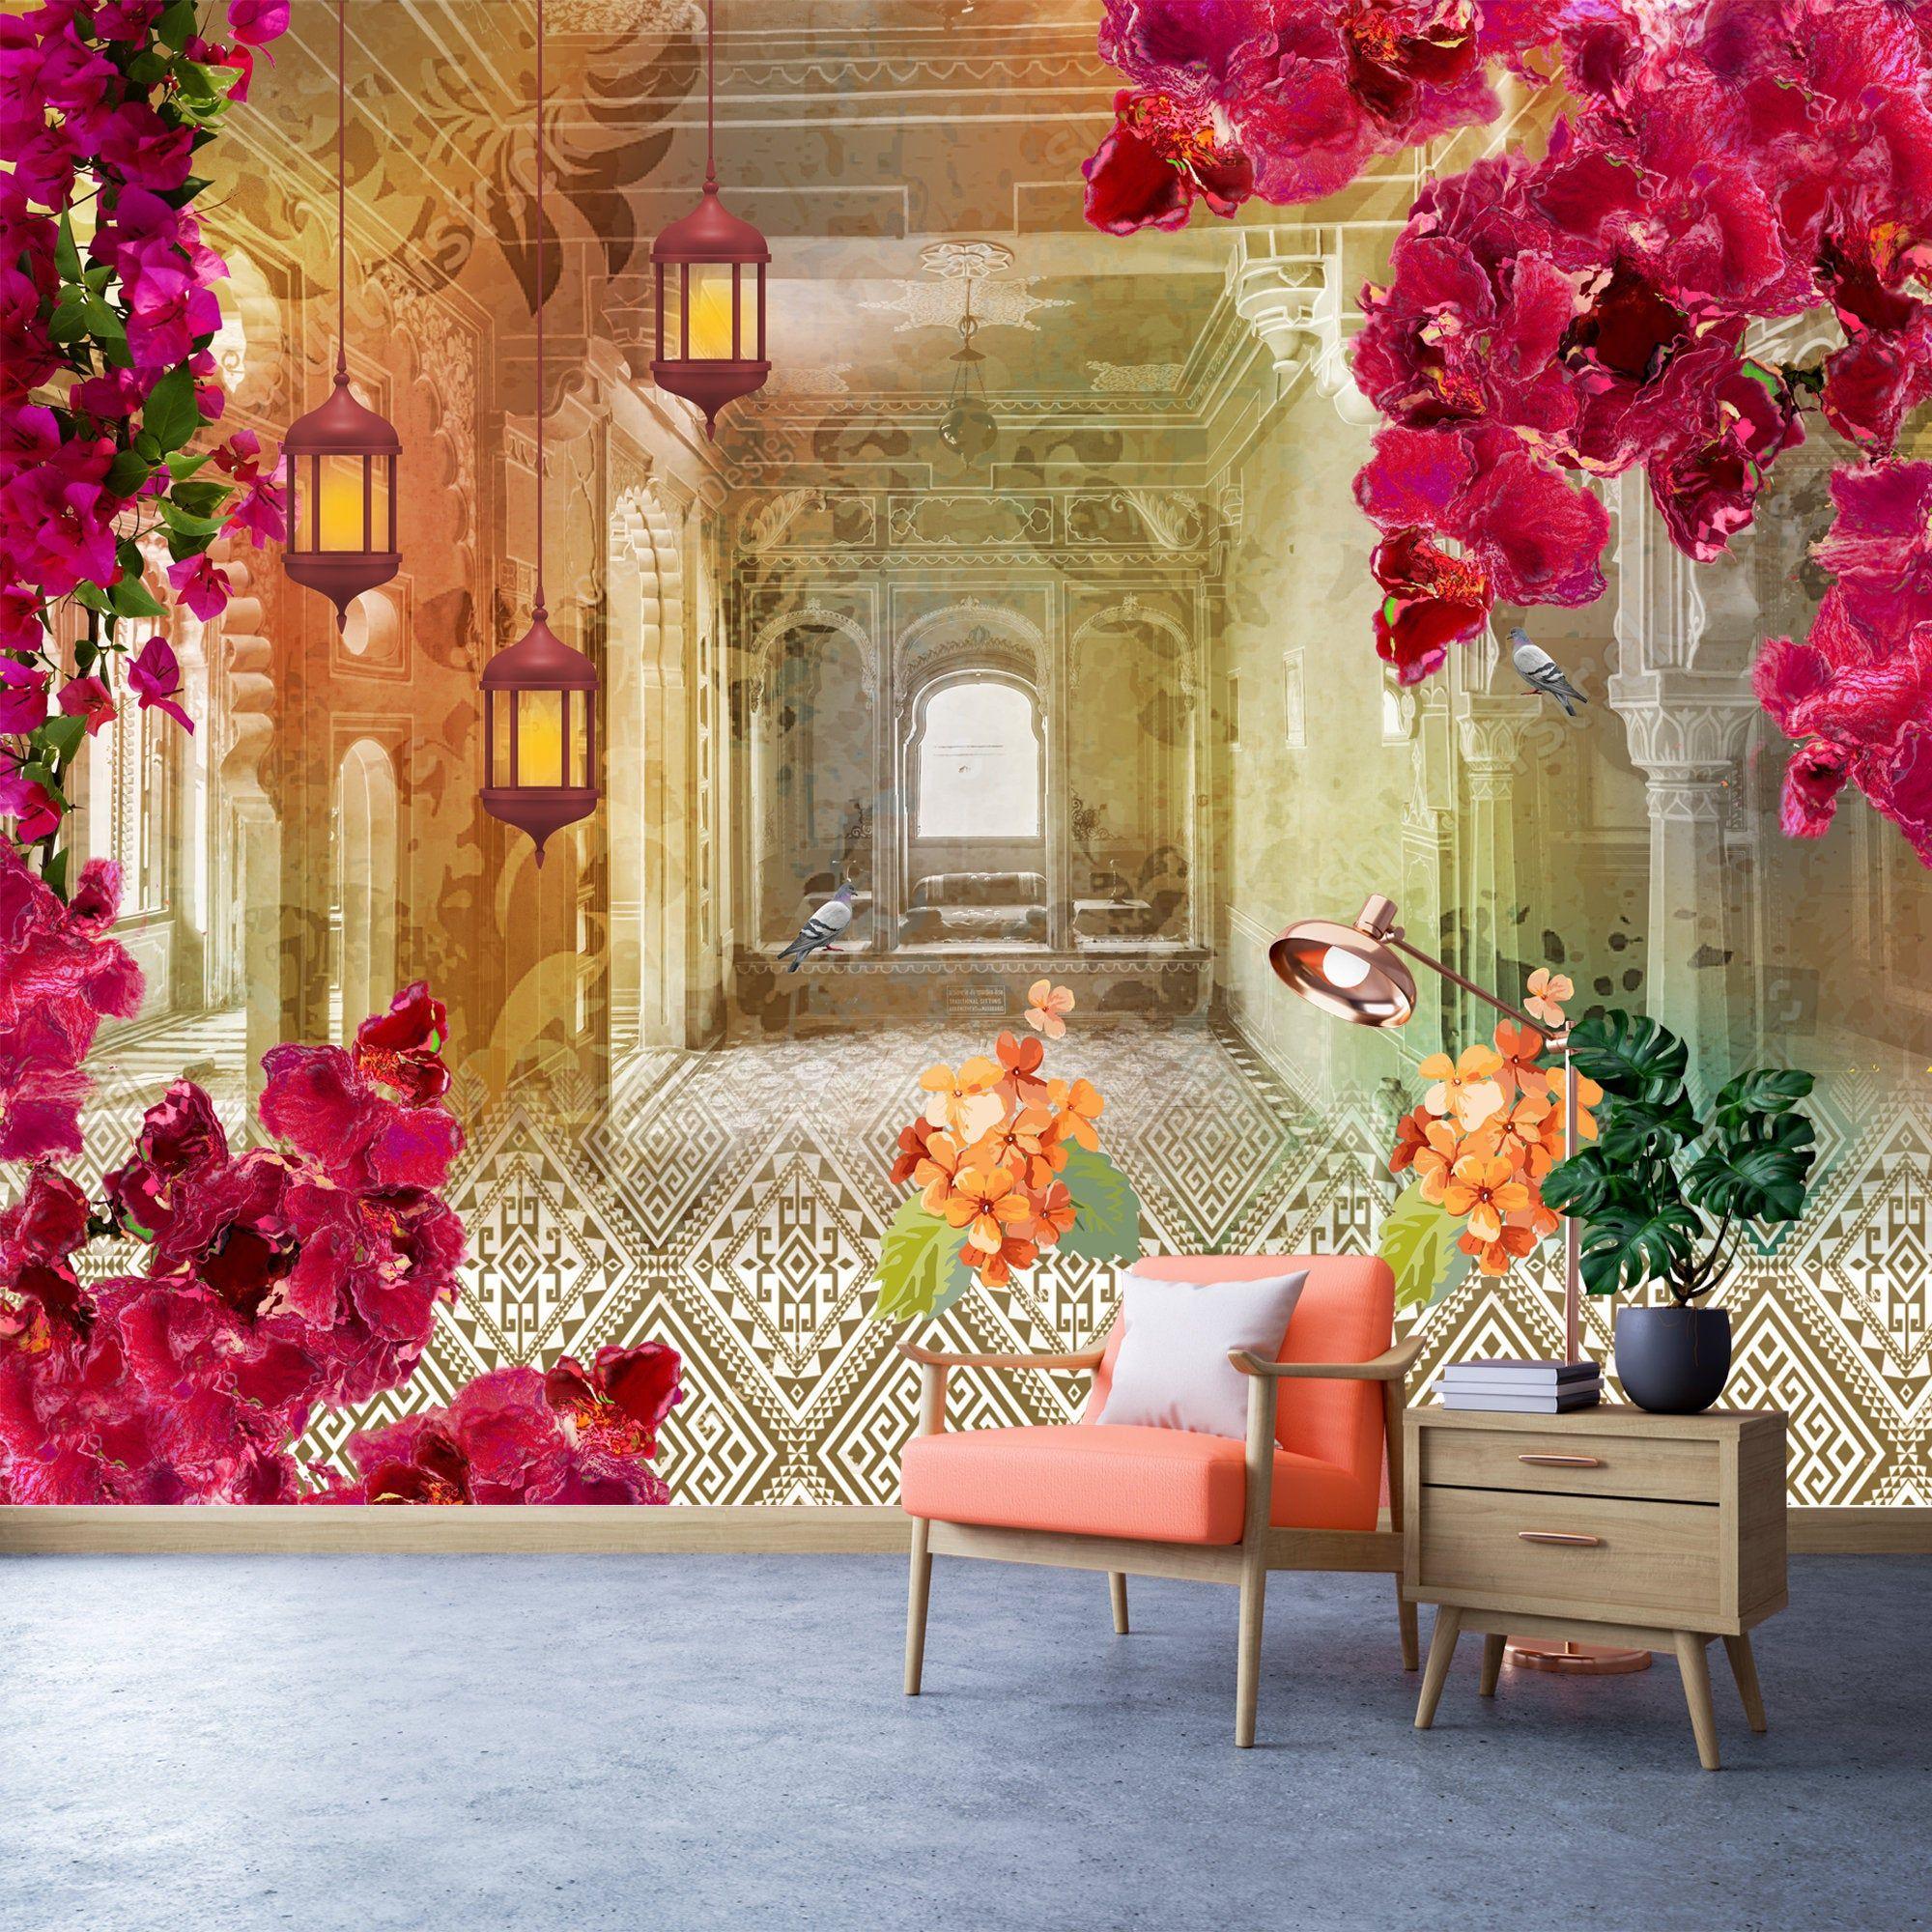 Indian Art Wallpaper Removable Wallpaper Arabic Theme Wall Etsy Wallpaper Walls Decor Removable Wallpaper Art Wallpaper